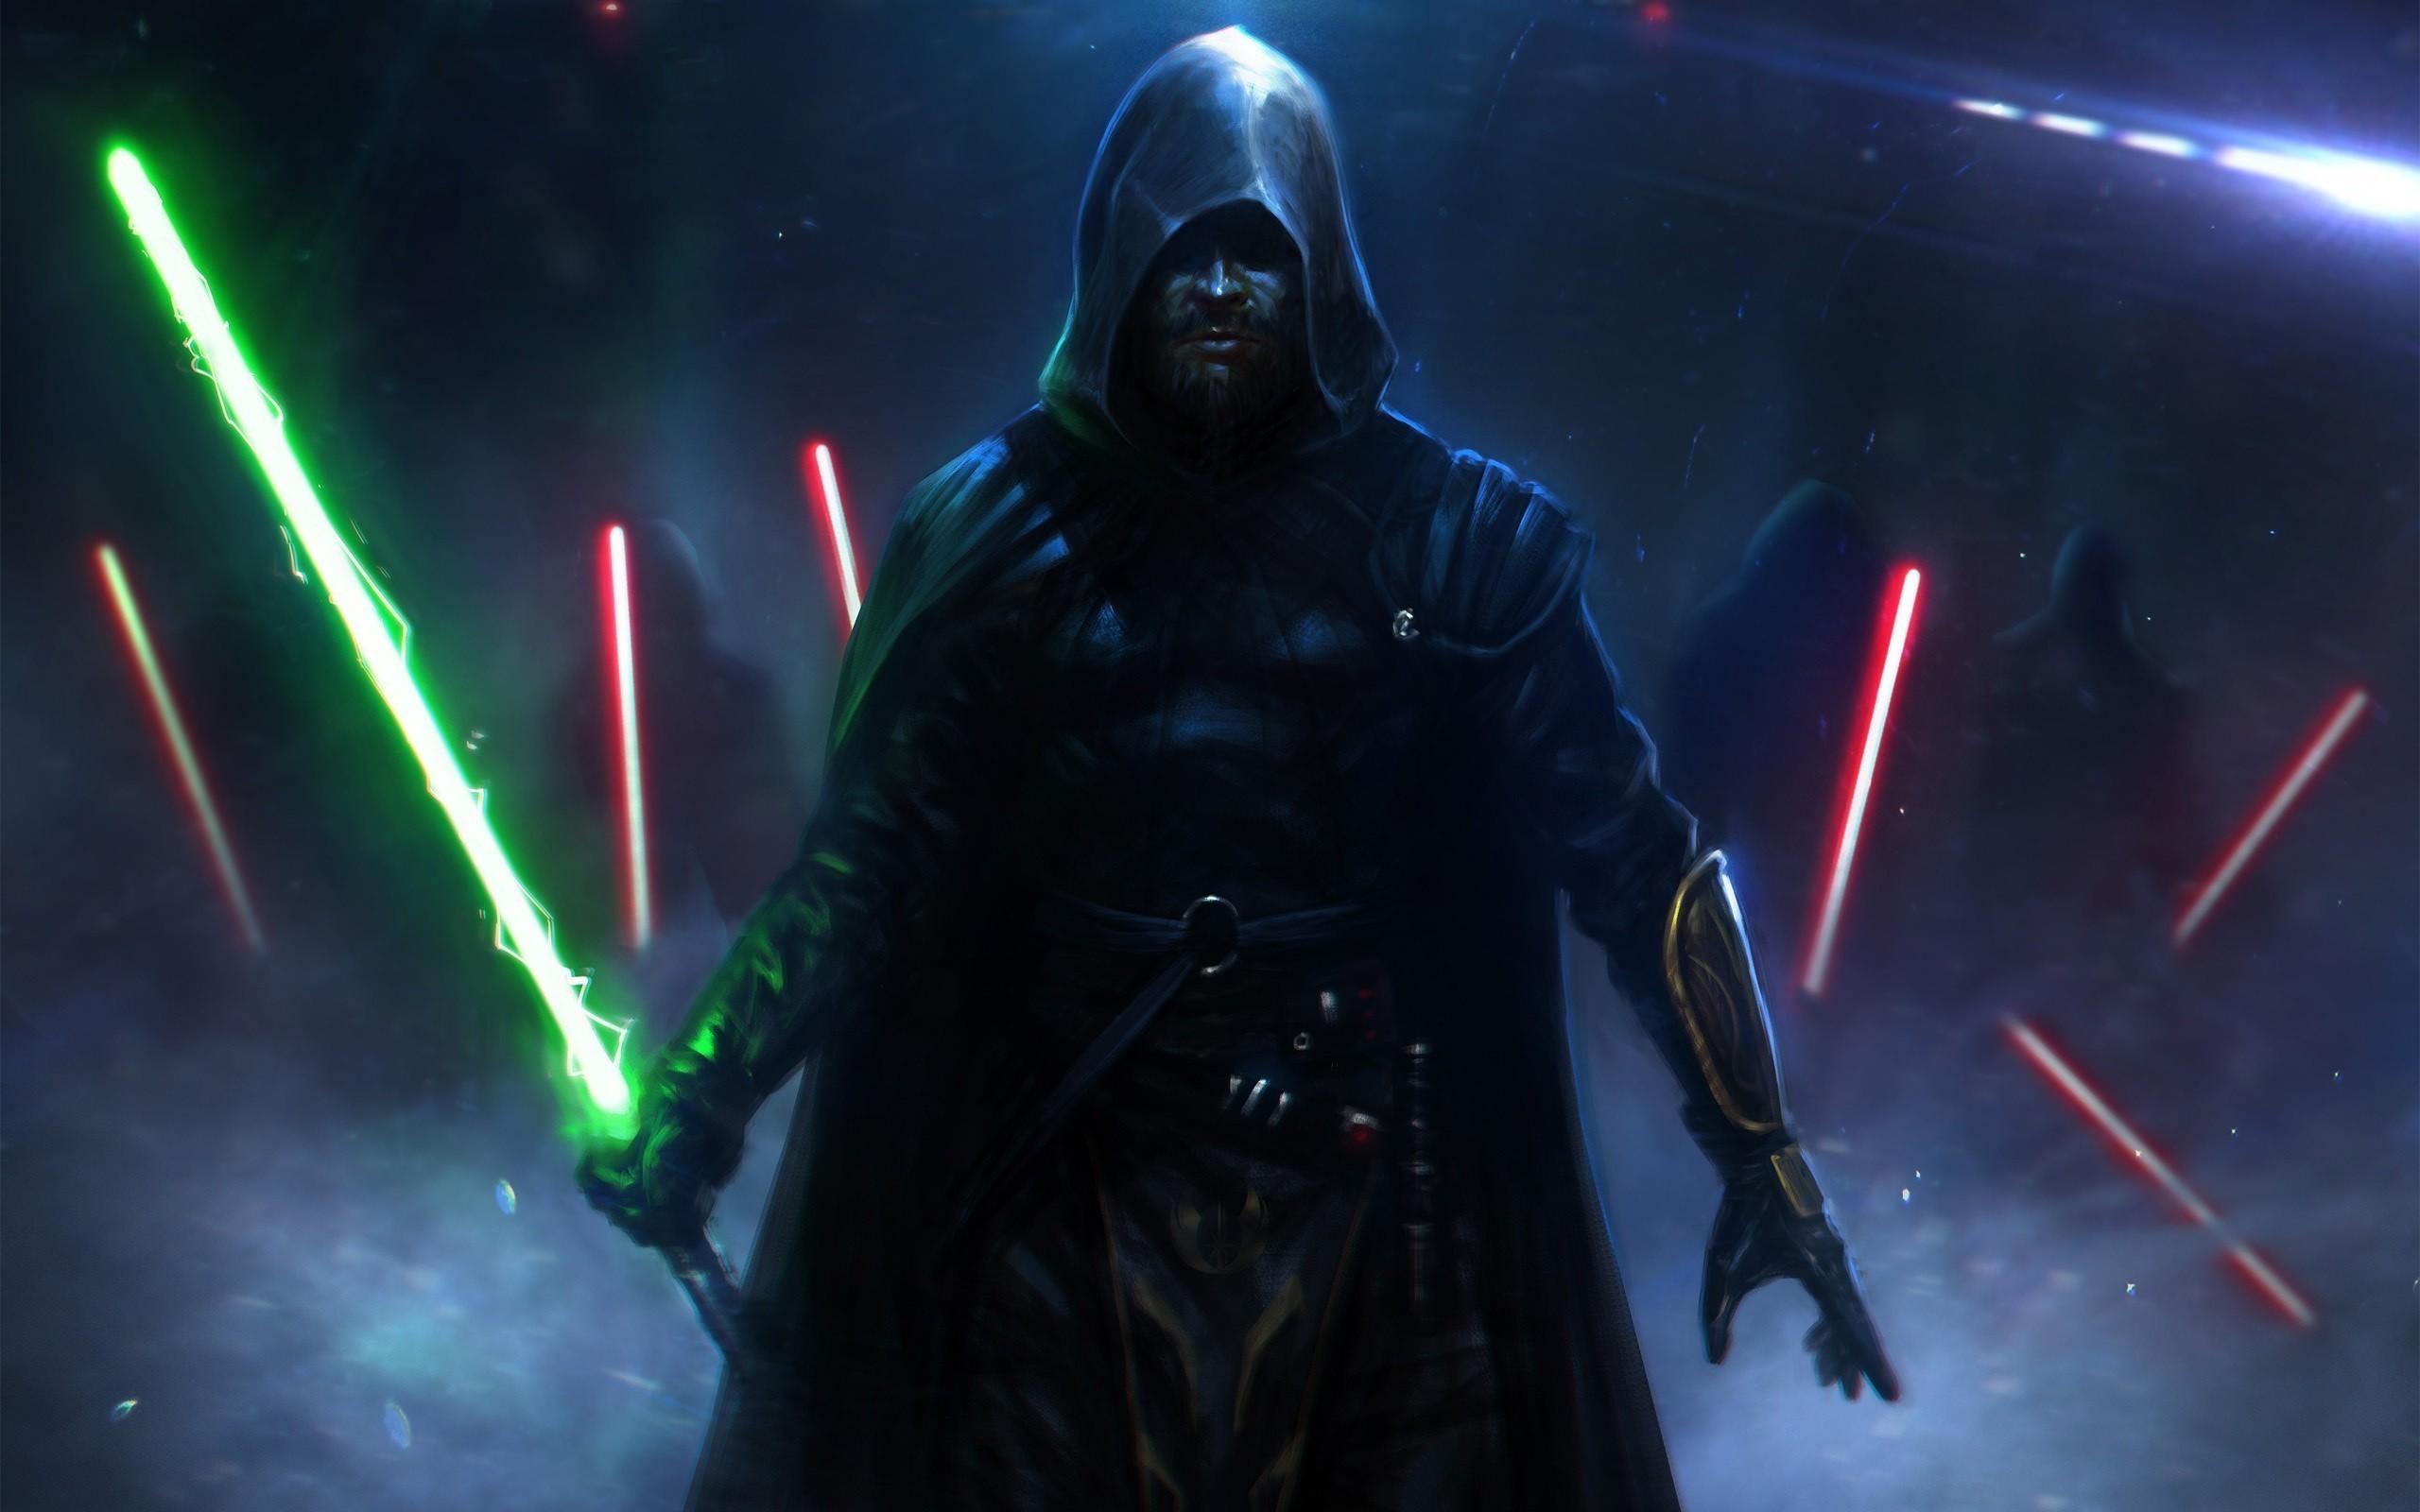 Star Wars Jedi Background As Wallpaper HD